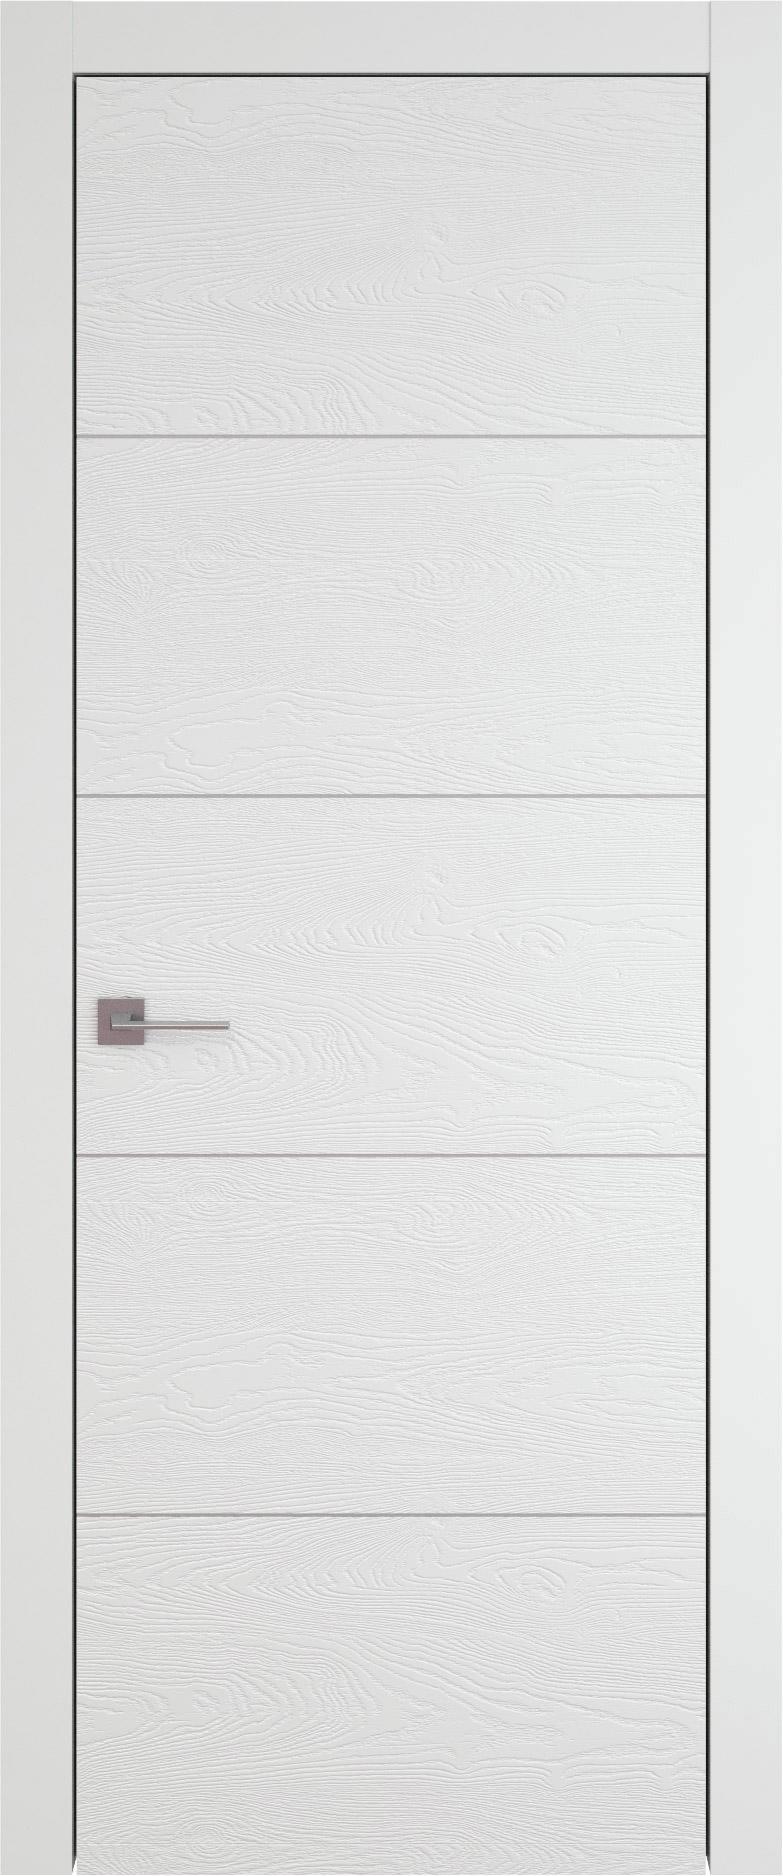 Tivoli Д-2 цвет - Белая эмаль по шпону (RAL 9003) Без стекла (ДГ)